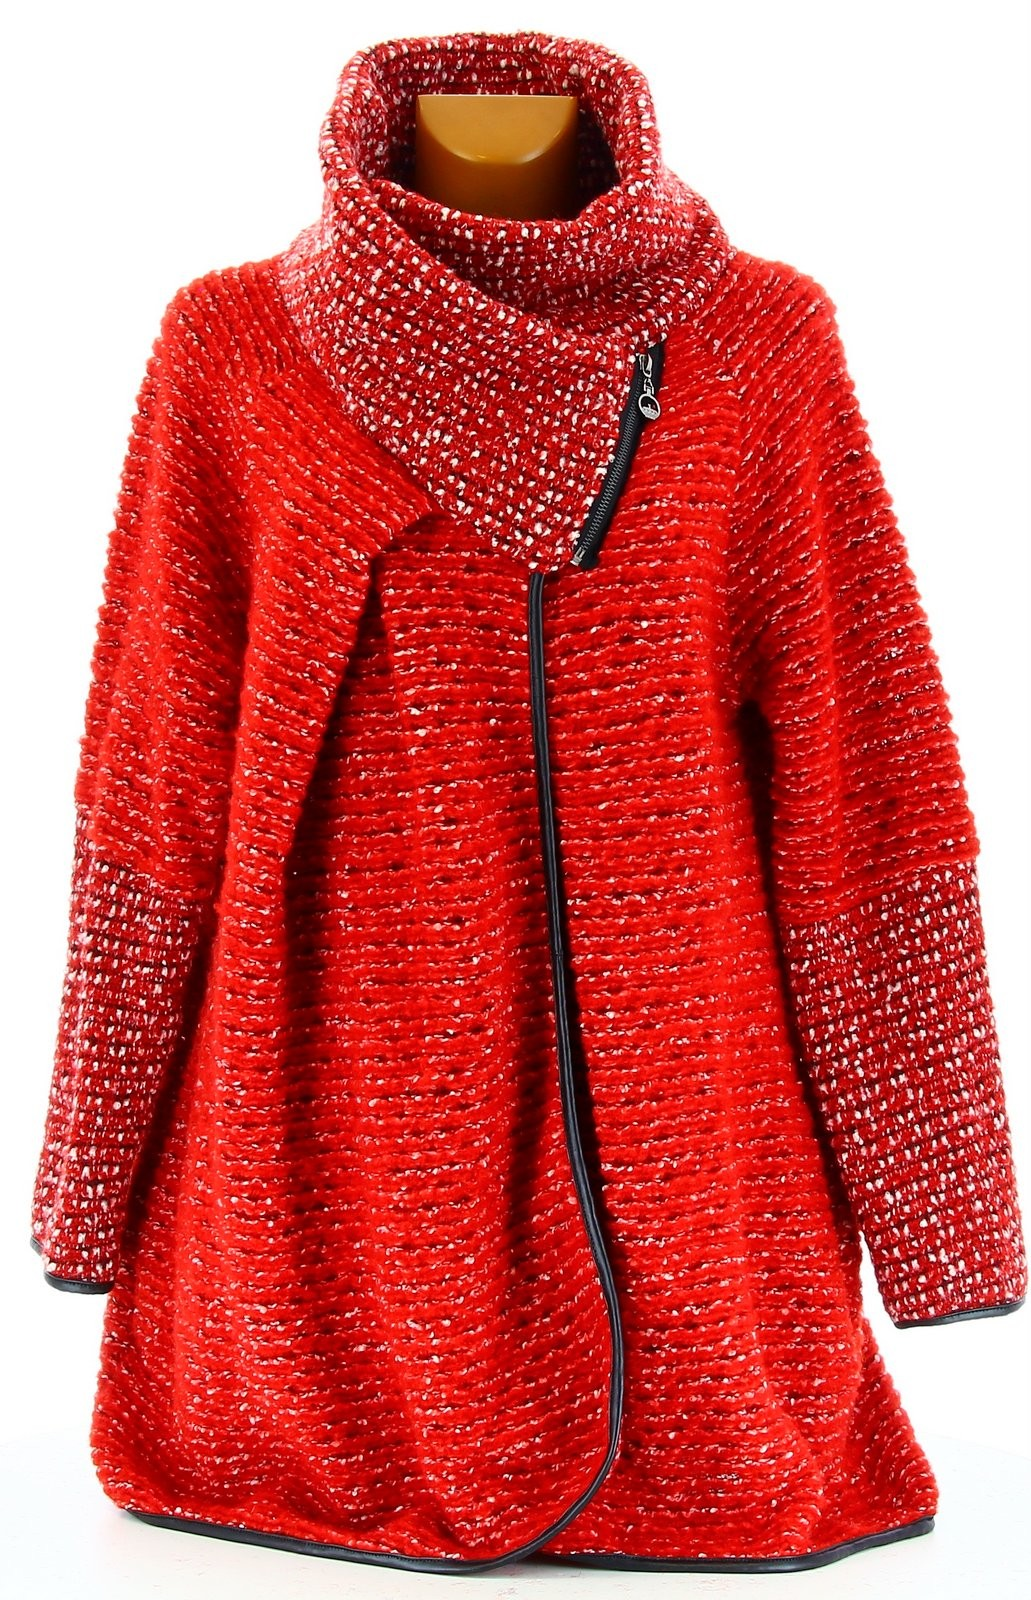 manteau cape laine bouillie hiver grande taille rouge violetta. Black Bedroom Furniture Sets. Home Design Ideas